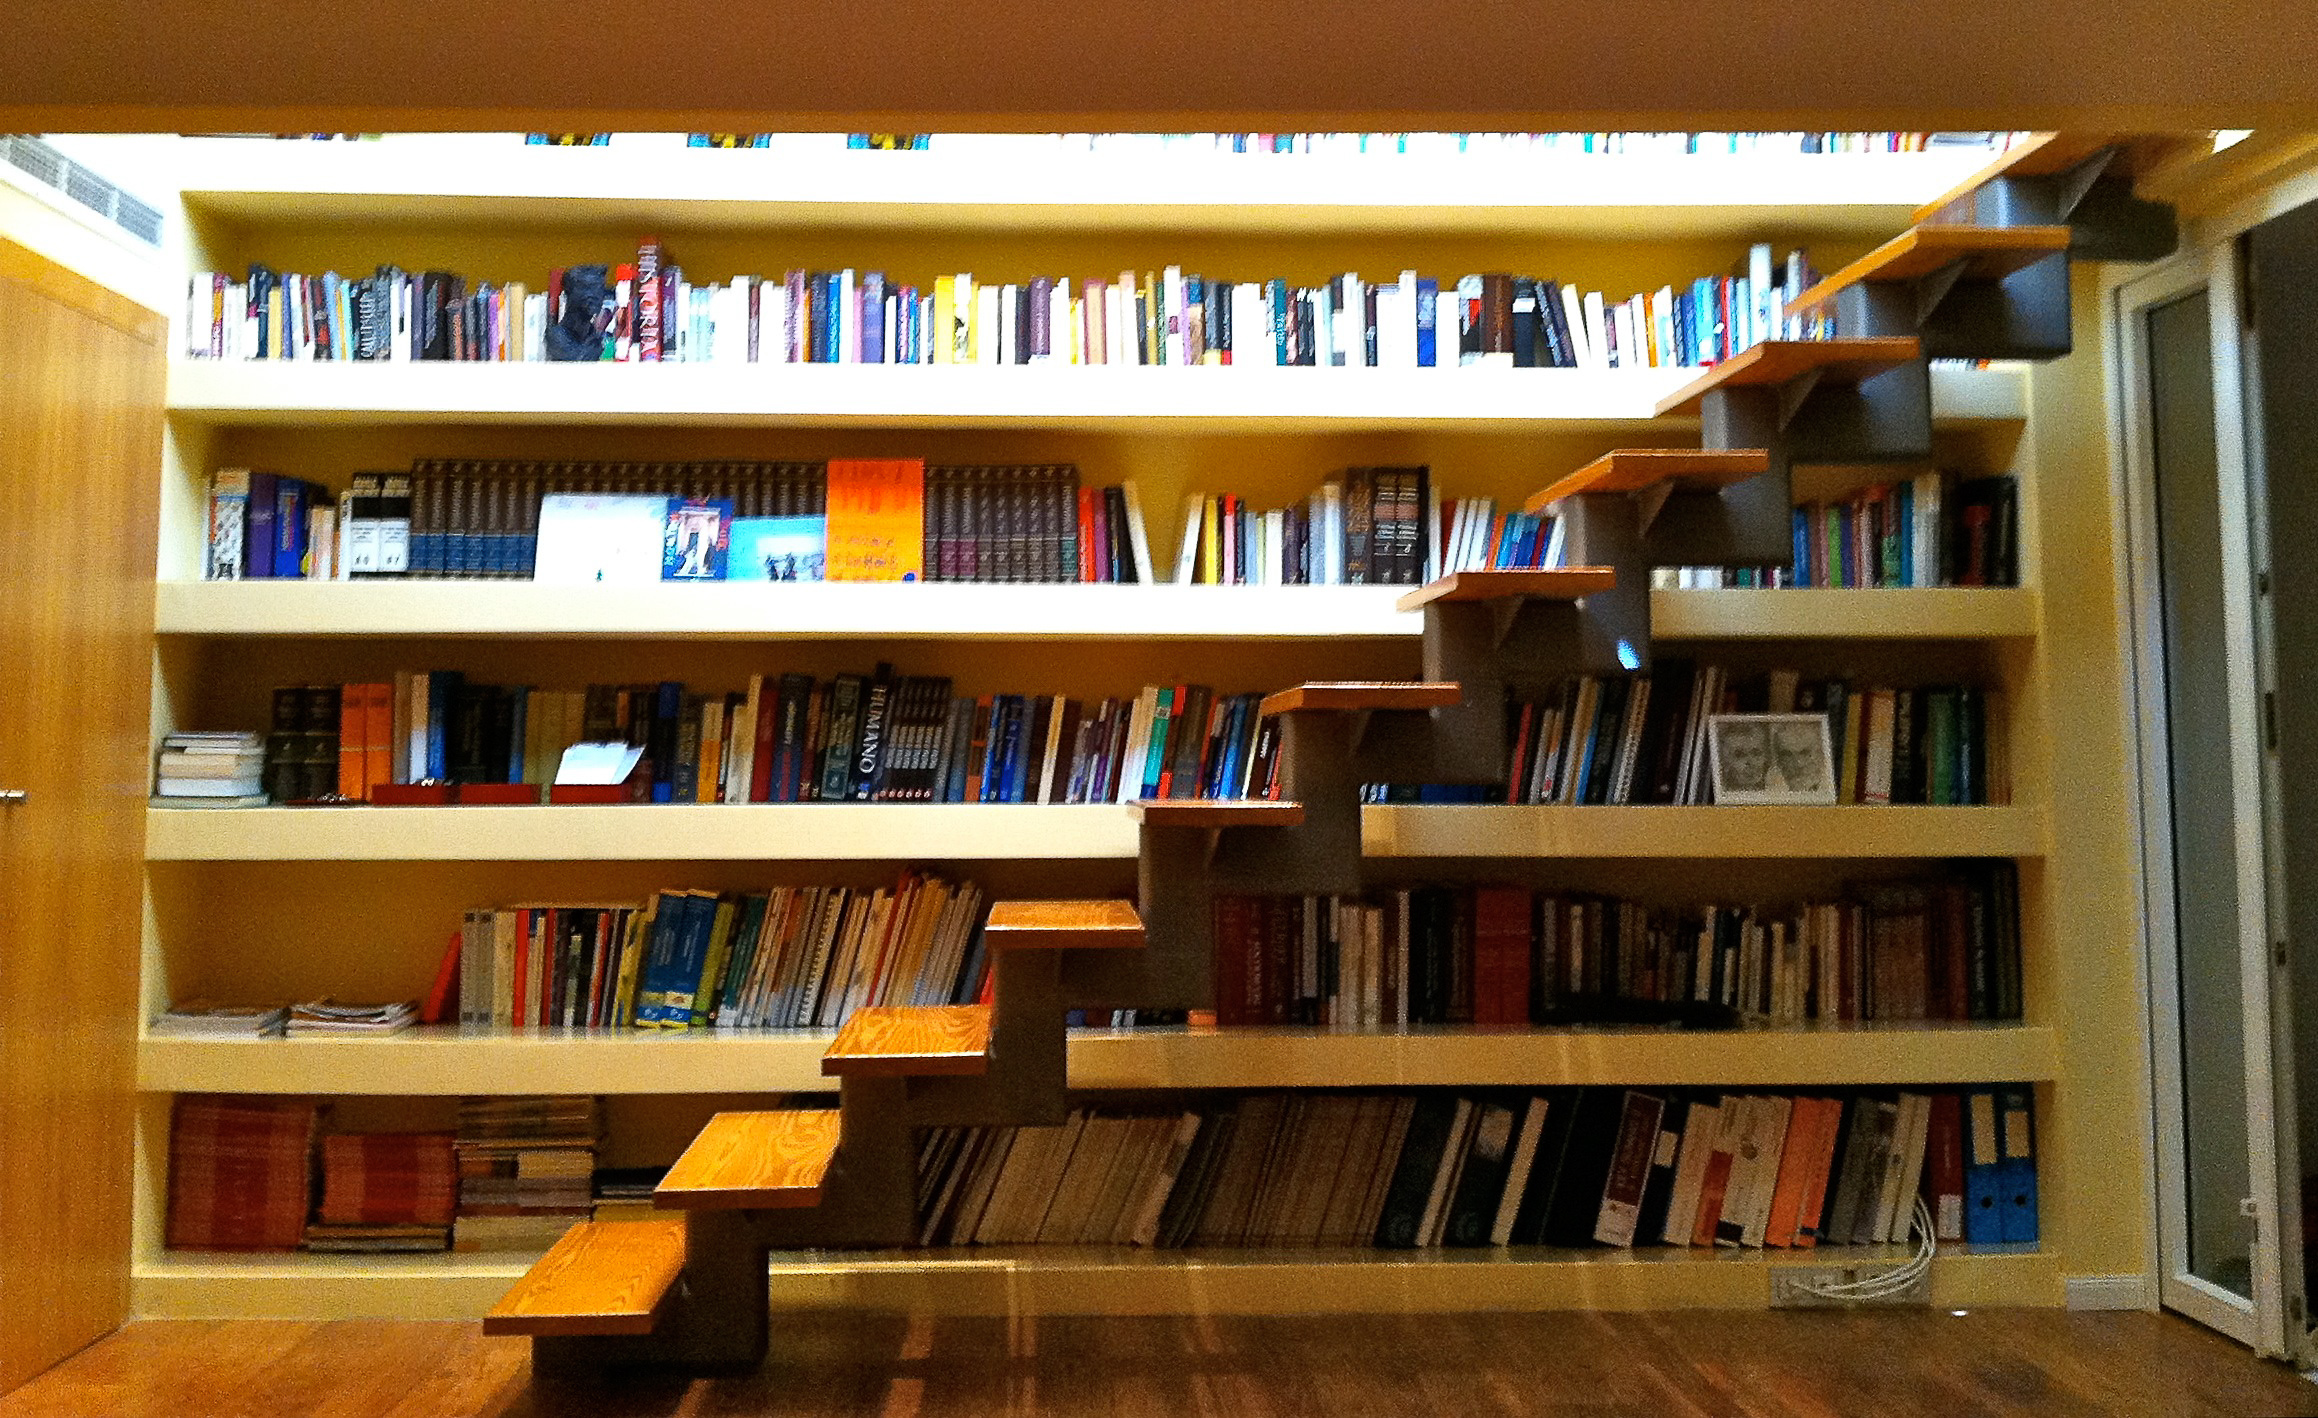 libreria 2.jpg